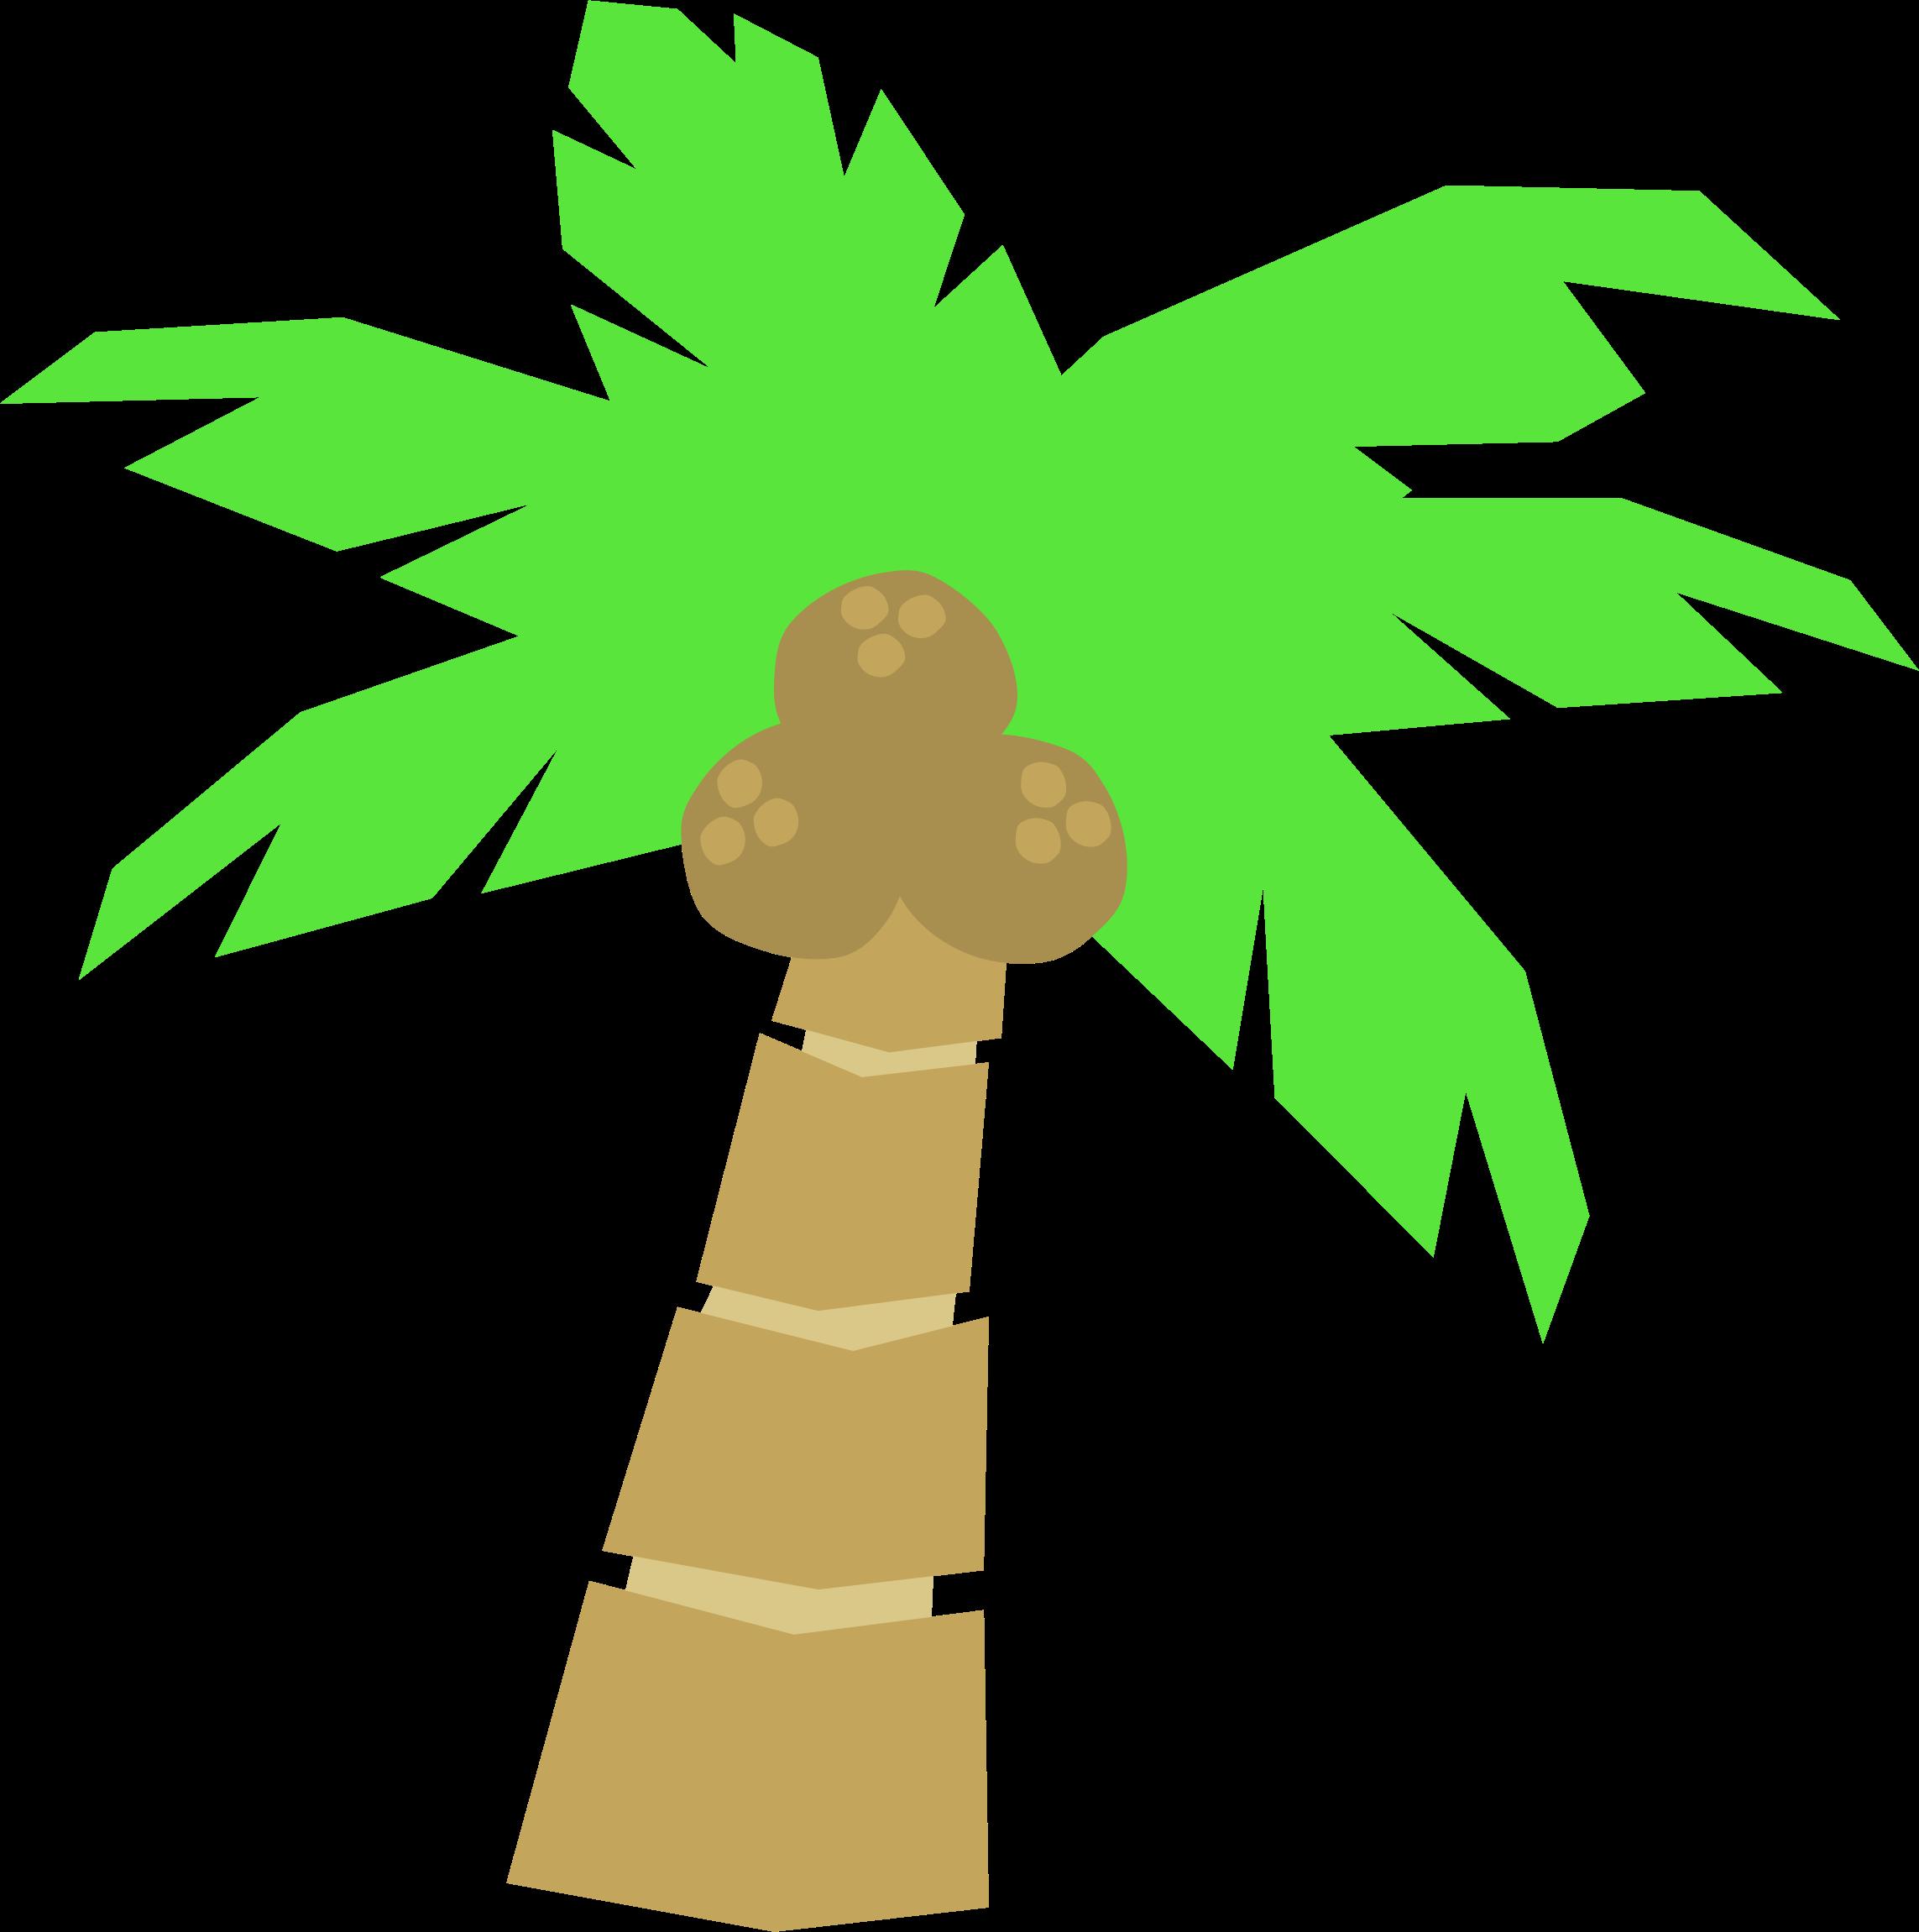 Palm Tree Art Tropical Palm Trees Clip A-Palm tree art tropical palm trees clip art clip art palm tree 3 - Clipartix-9